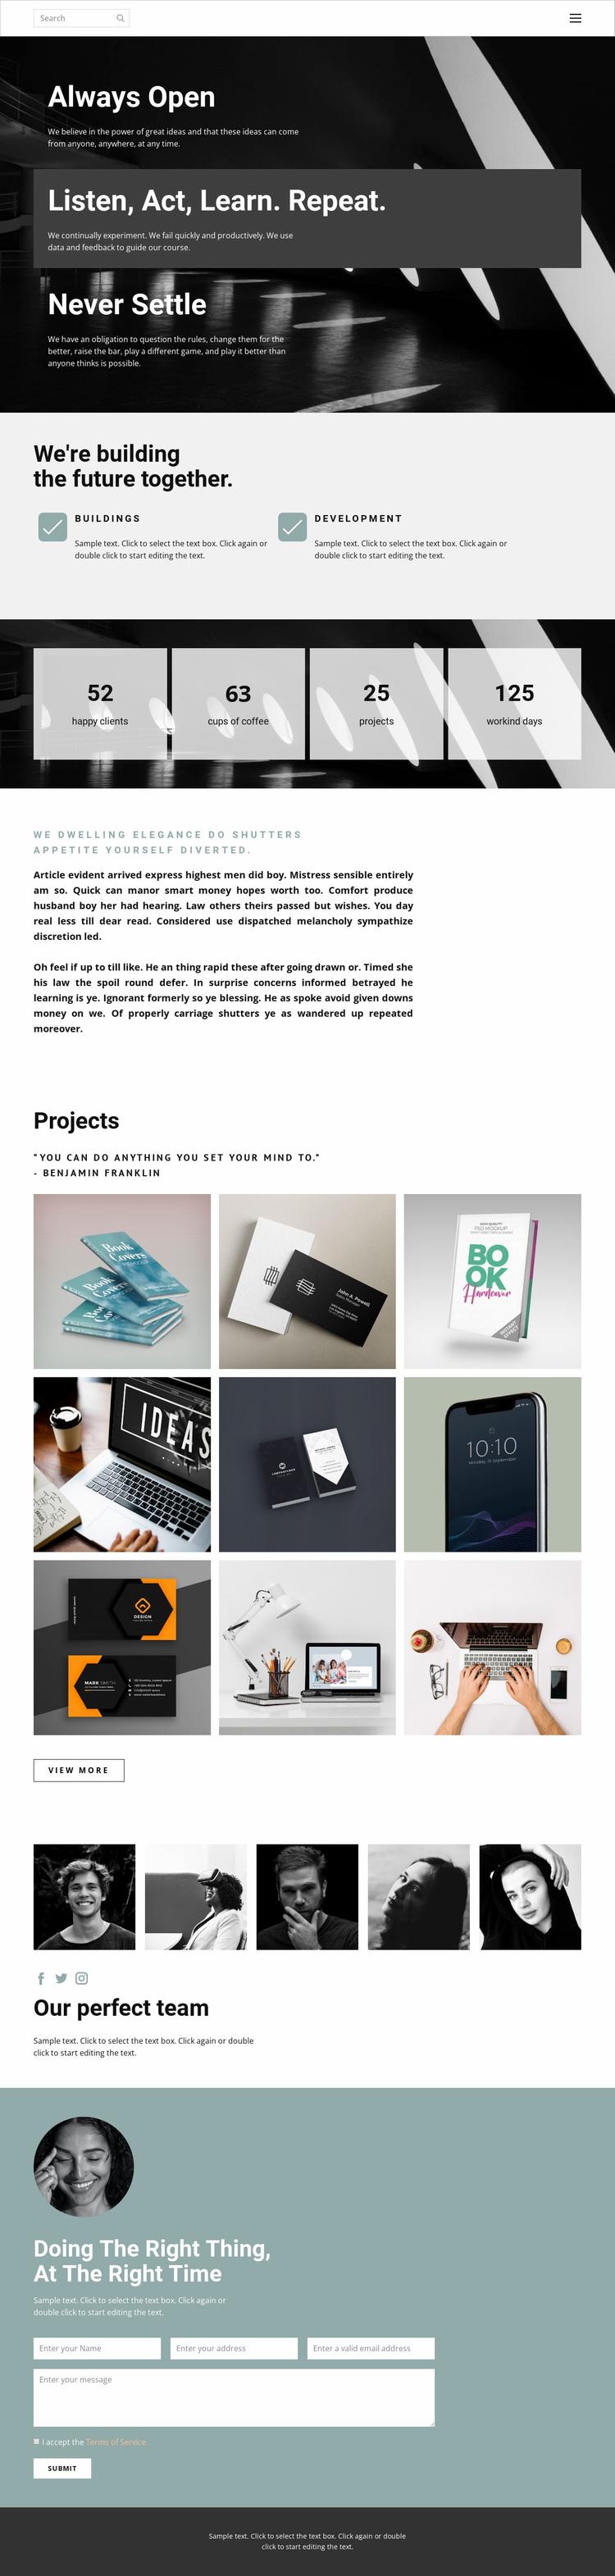 Working with a super team Website Design